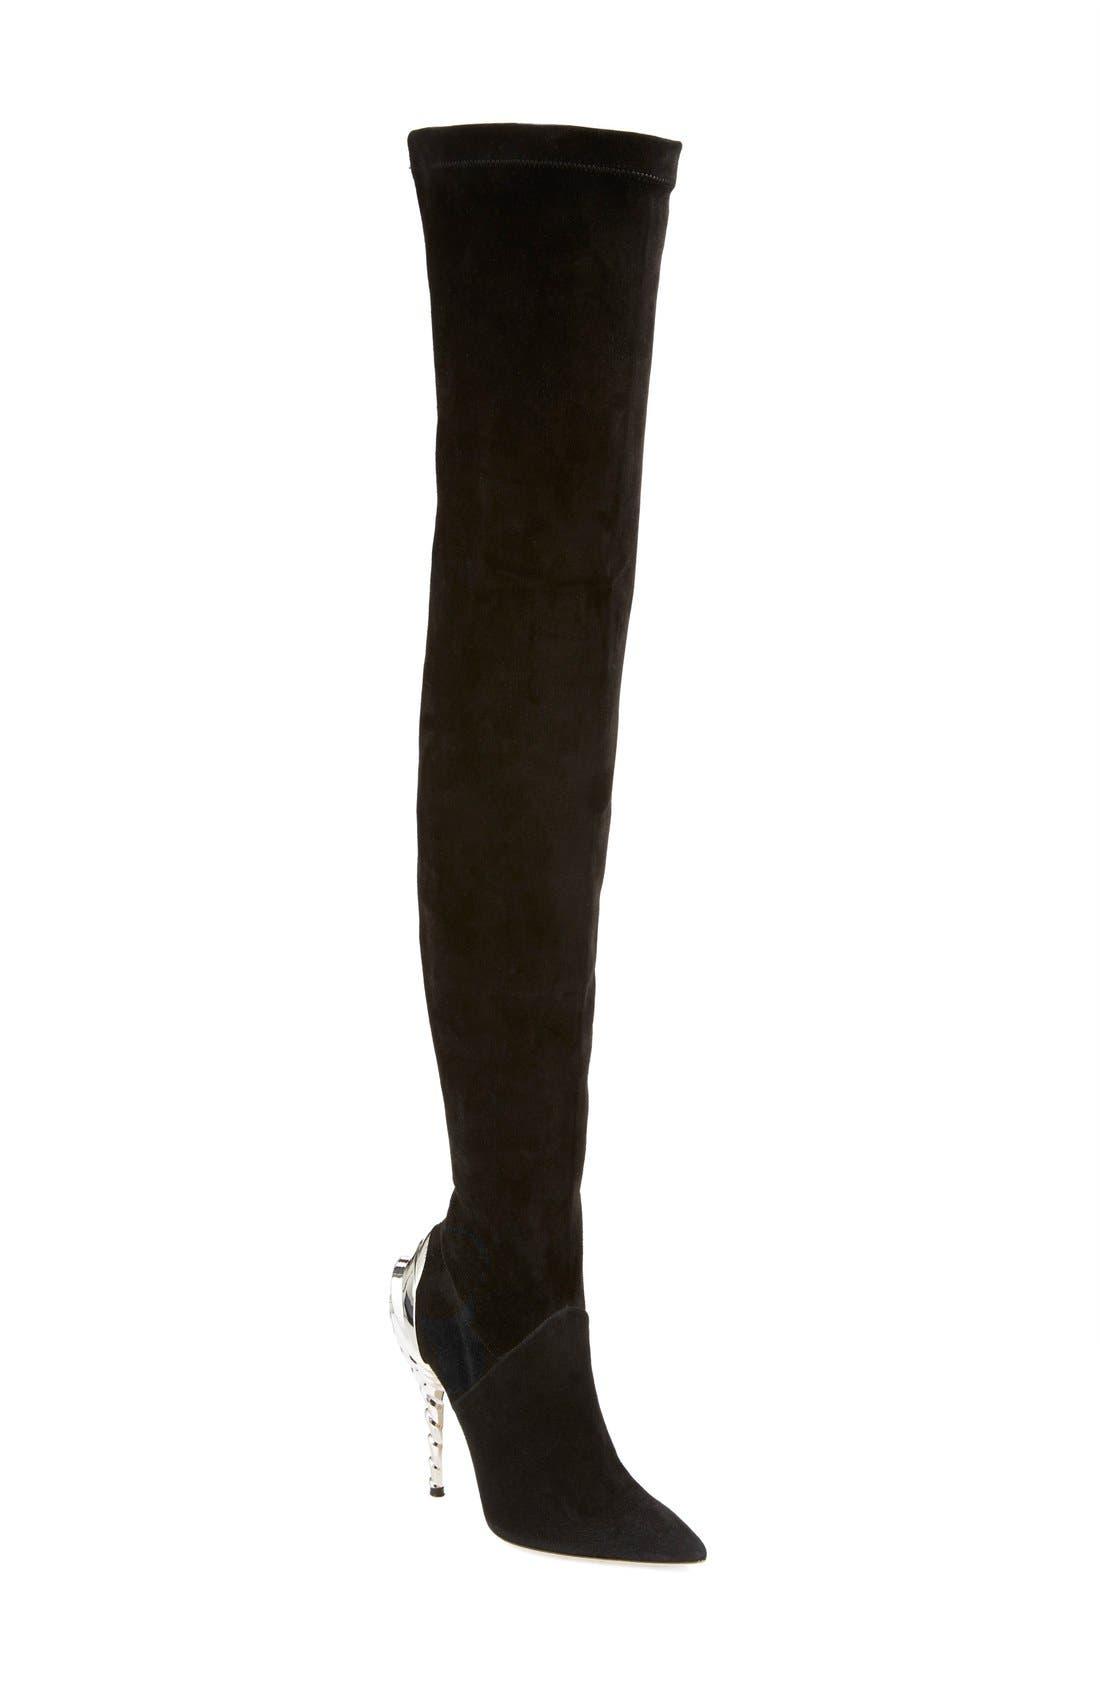 Main Image - Paul Andrew 'Chrysler' Thigh High Boot (Women) (Narrow Calf)